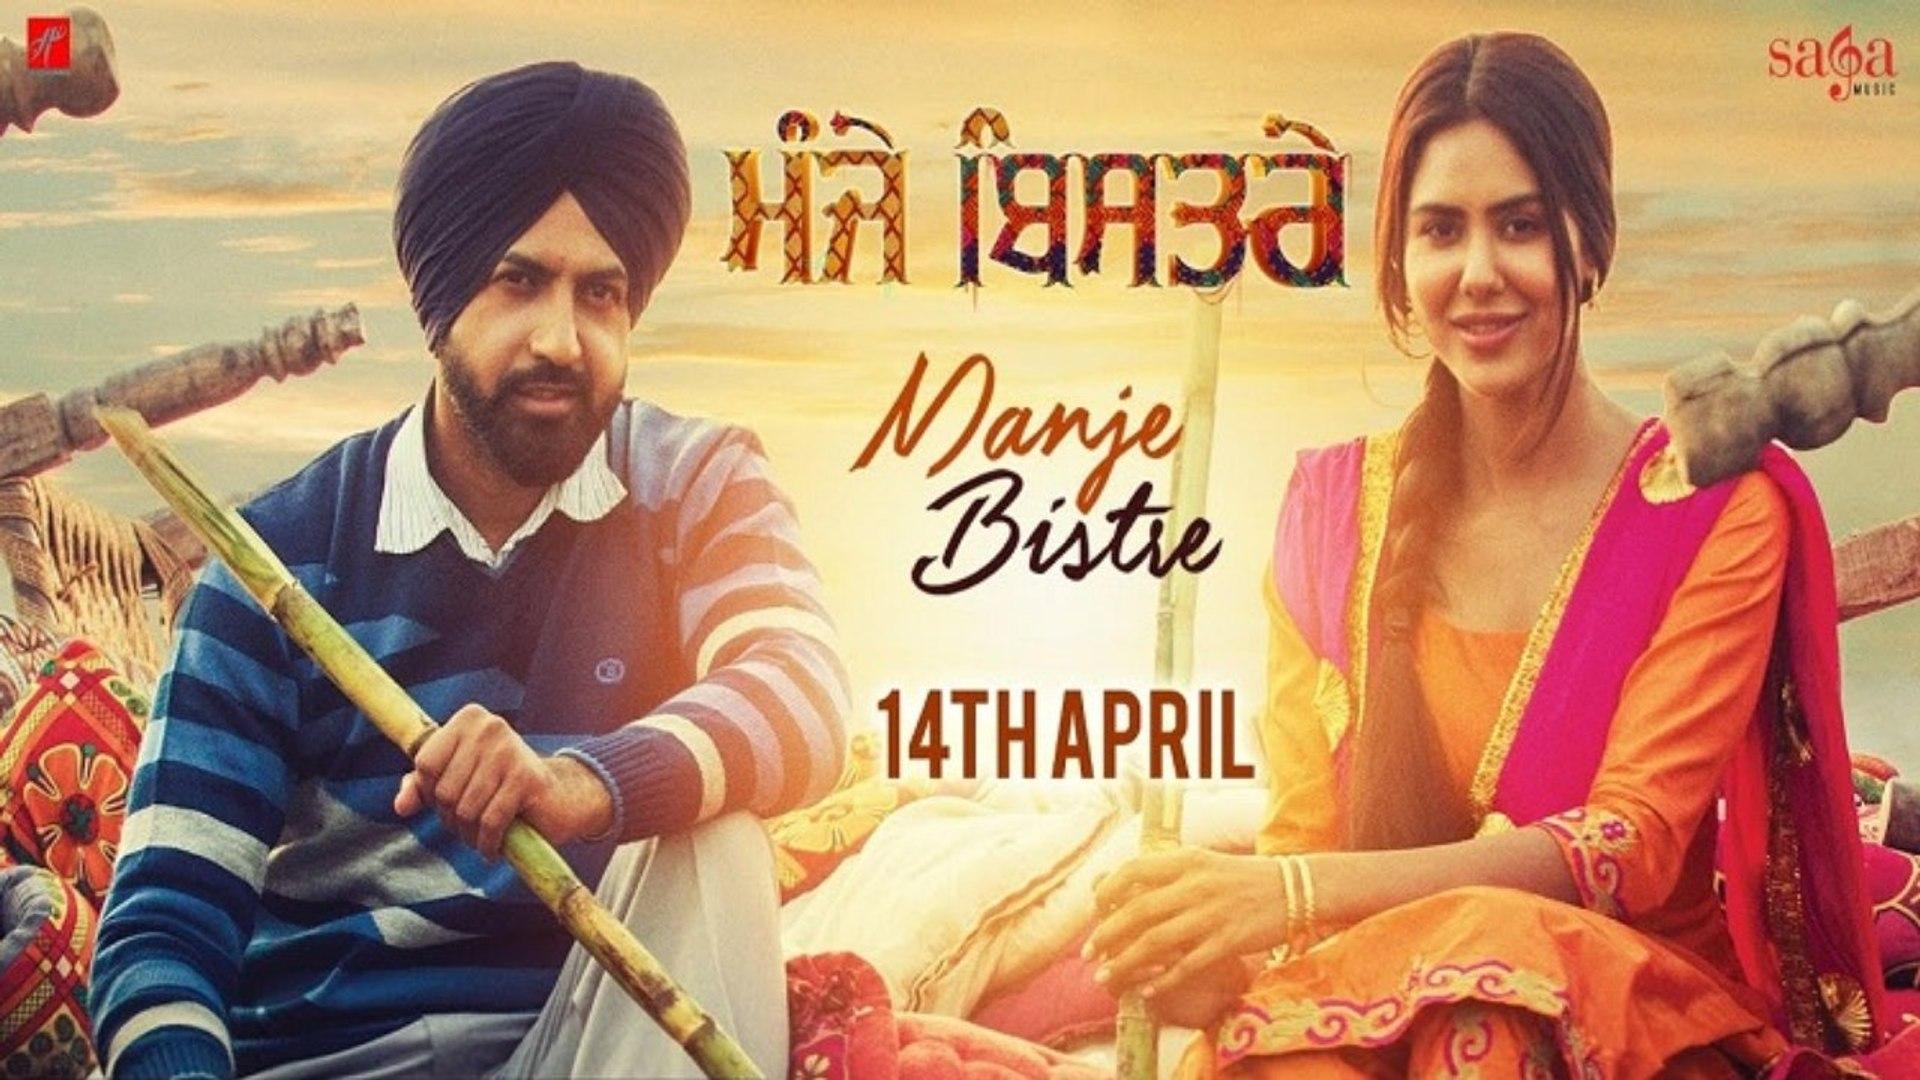 Manje bistre (2017) part 1 - 3 full punjabi movie